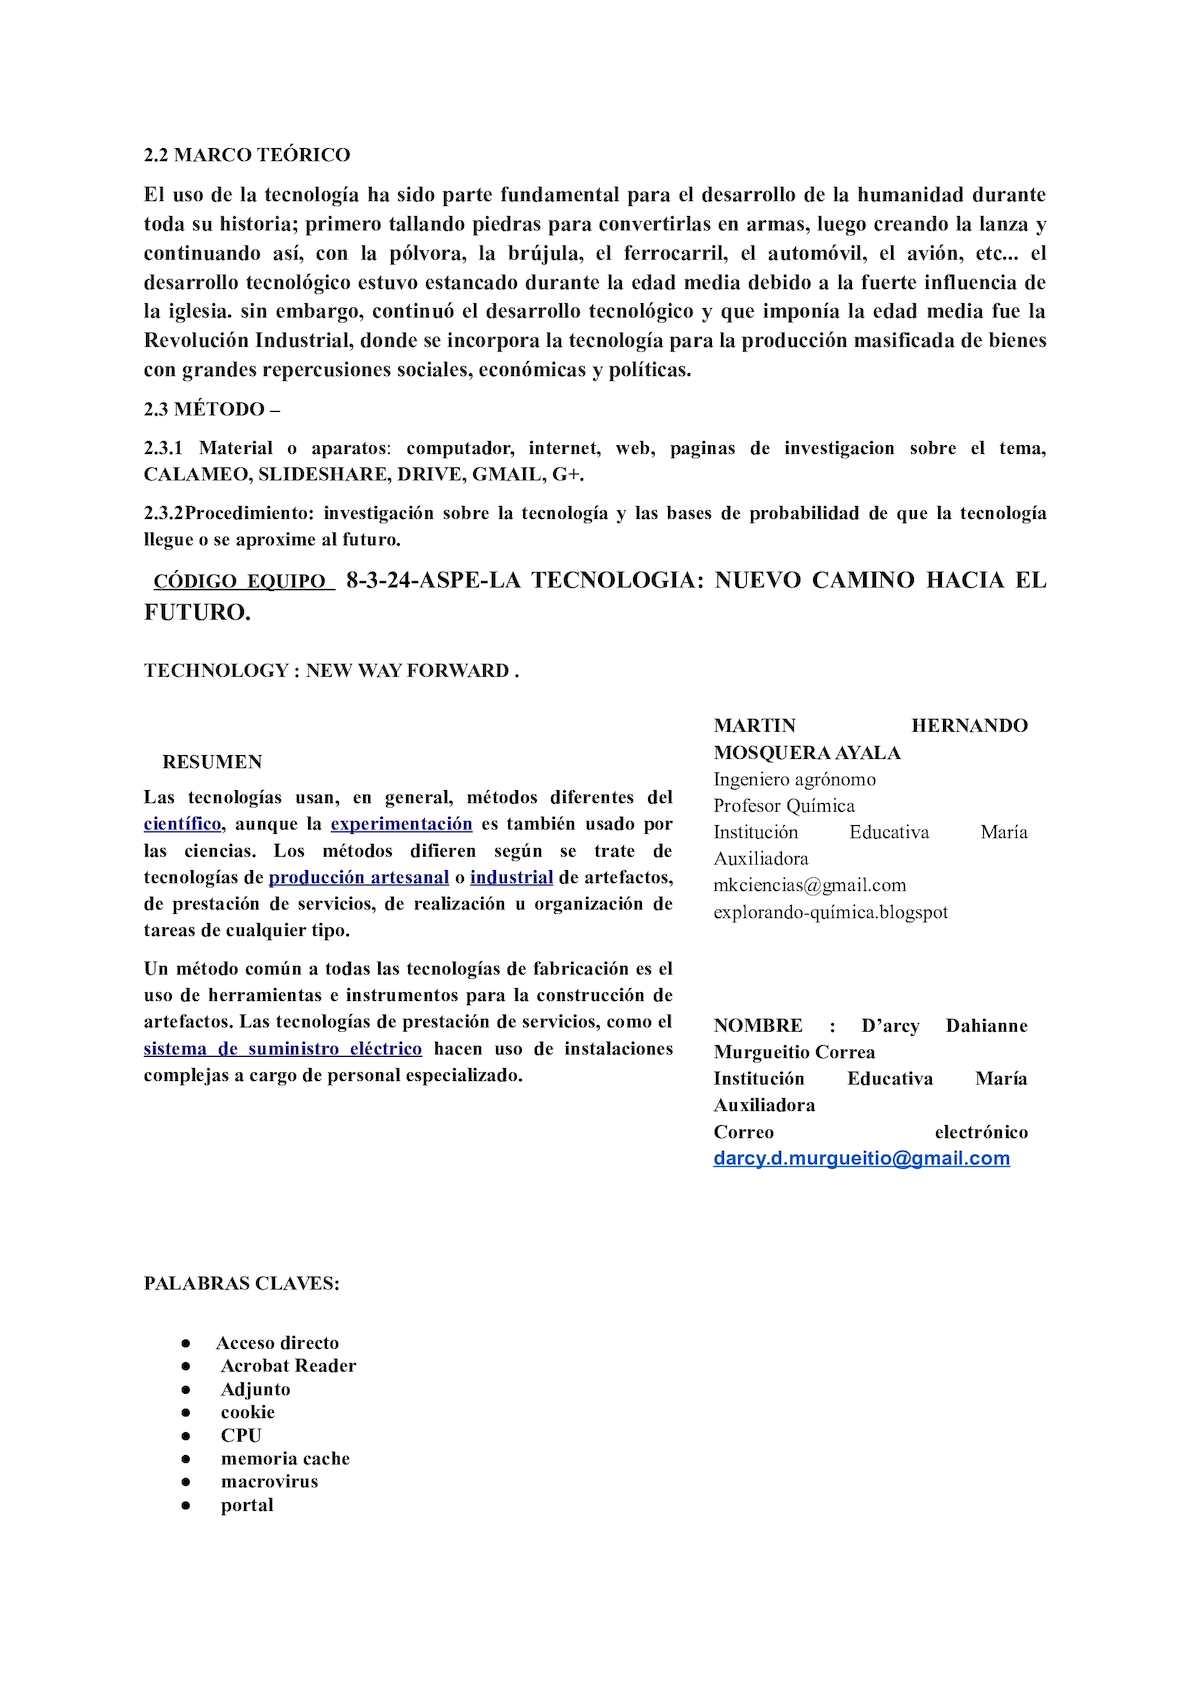 Calaméo - 8 3 24 Aspe Latecnologianuevocaminohaciaelfuturo (1)